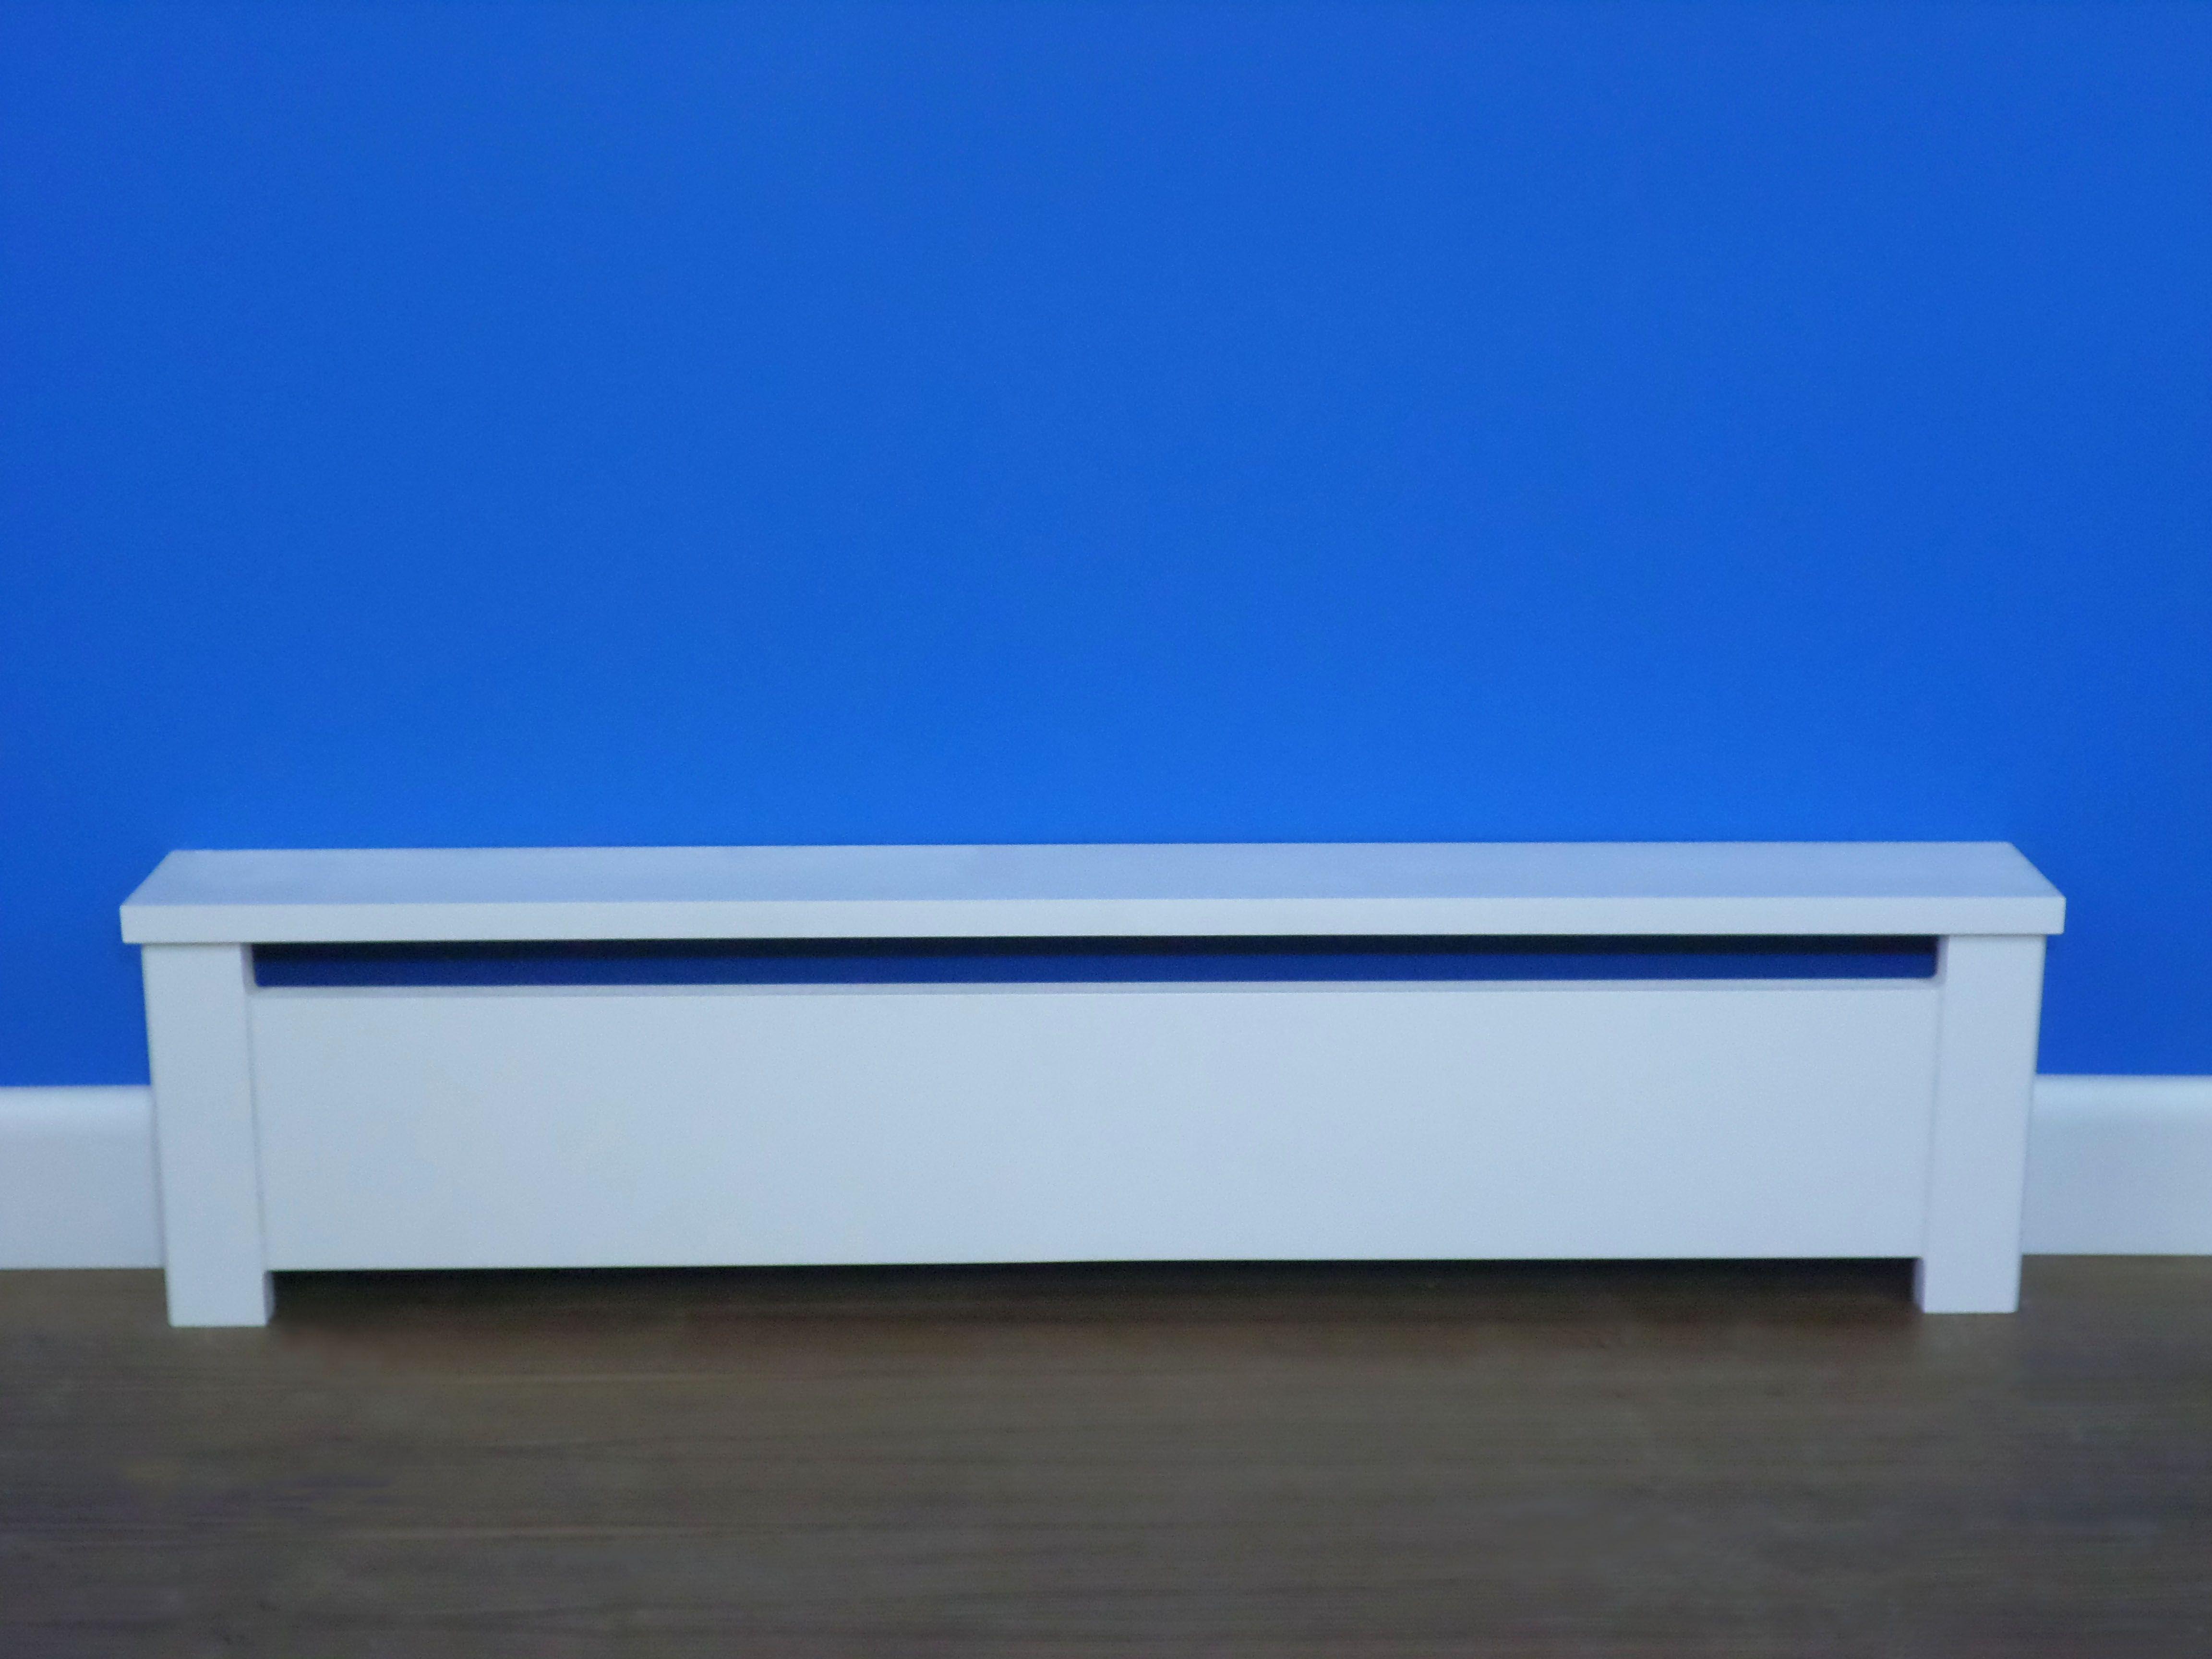 Jays Custom Baseboard Covers Radiator Covers And More Baseboard Heater Covers Baseboard Heater Baseboards